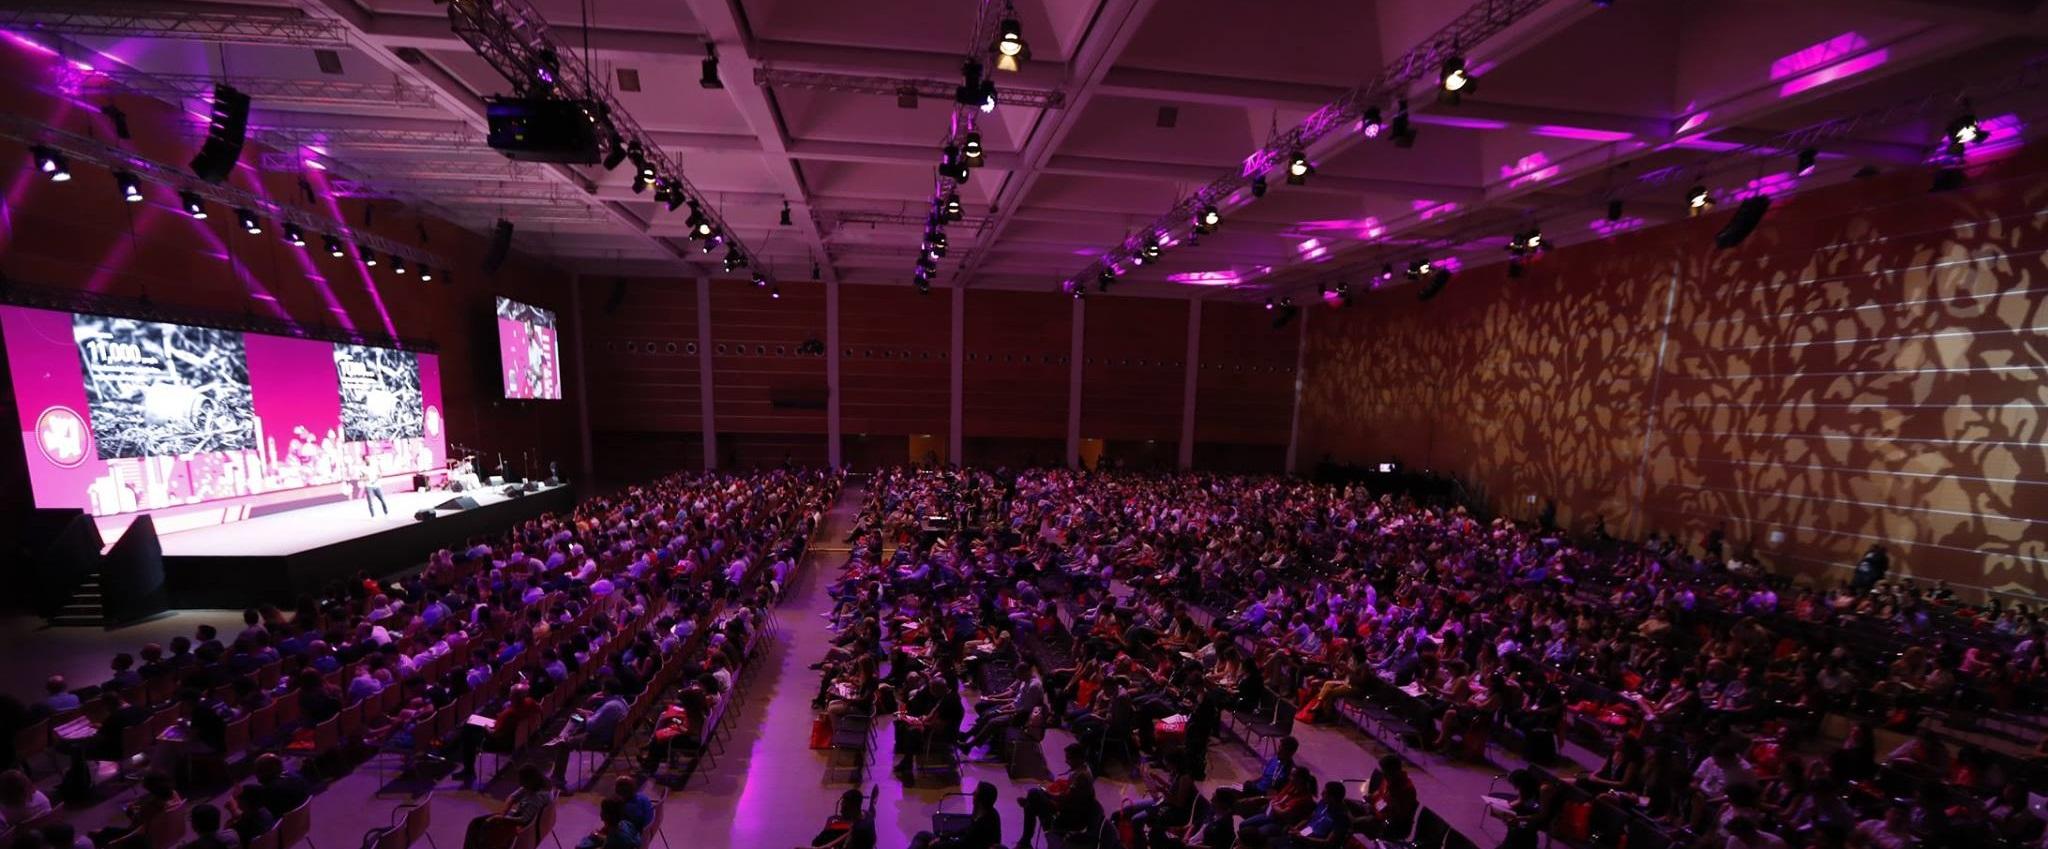 panoramica-plenaria01